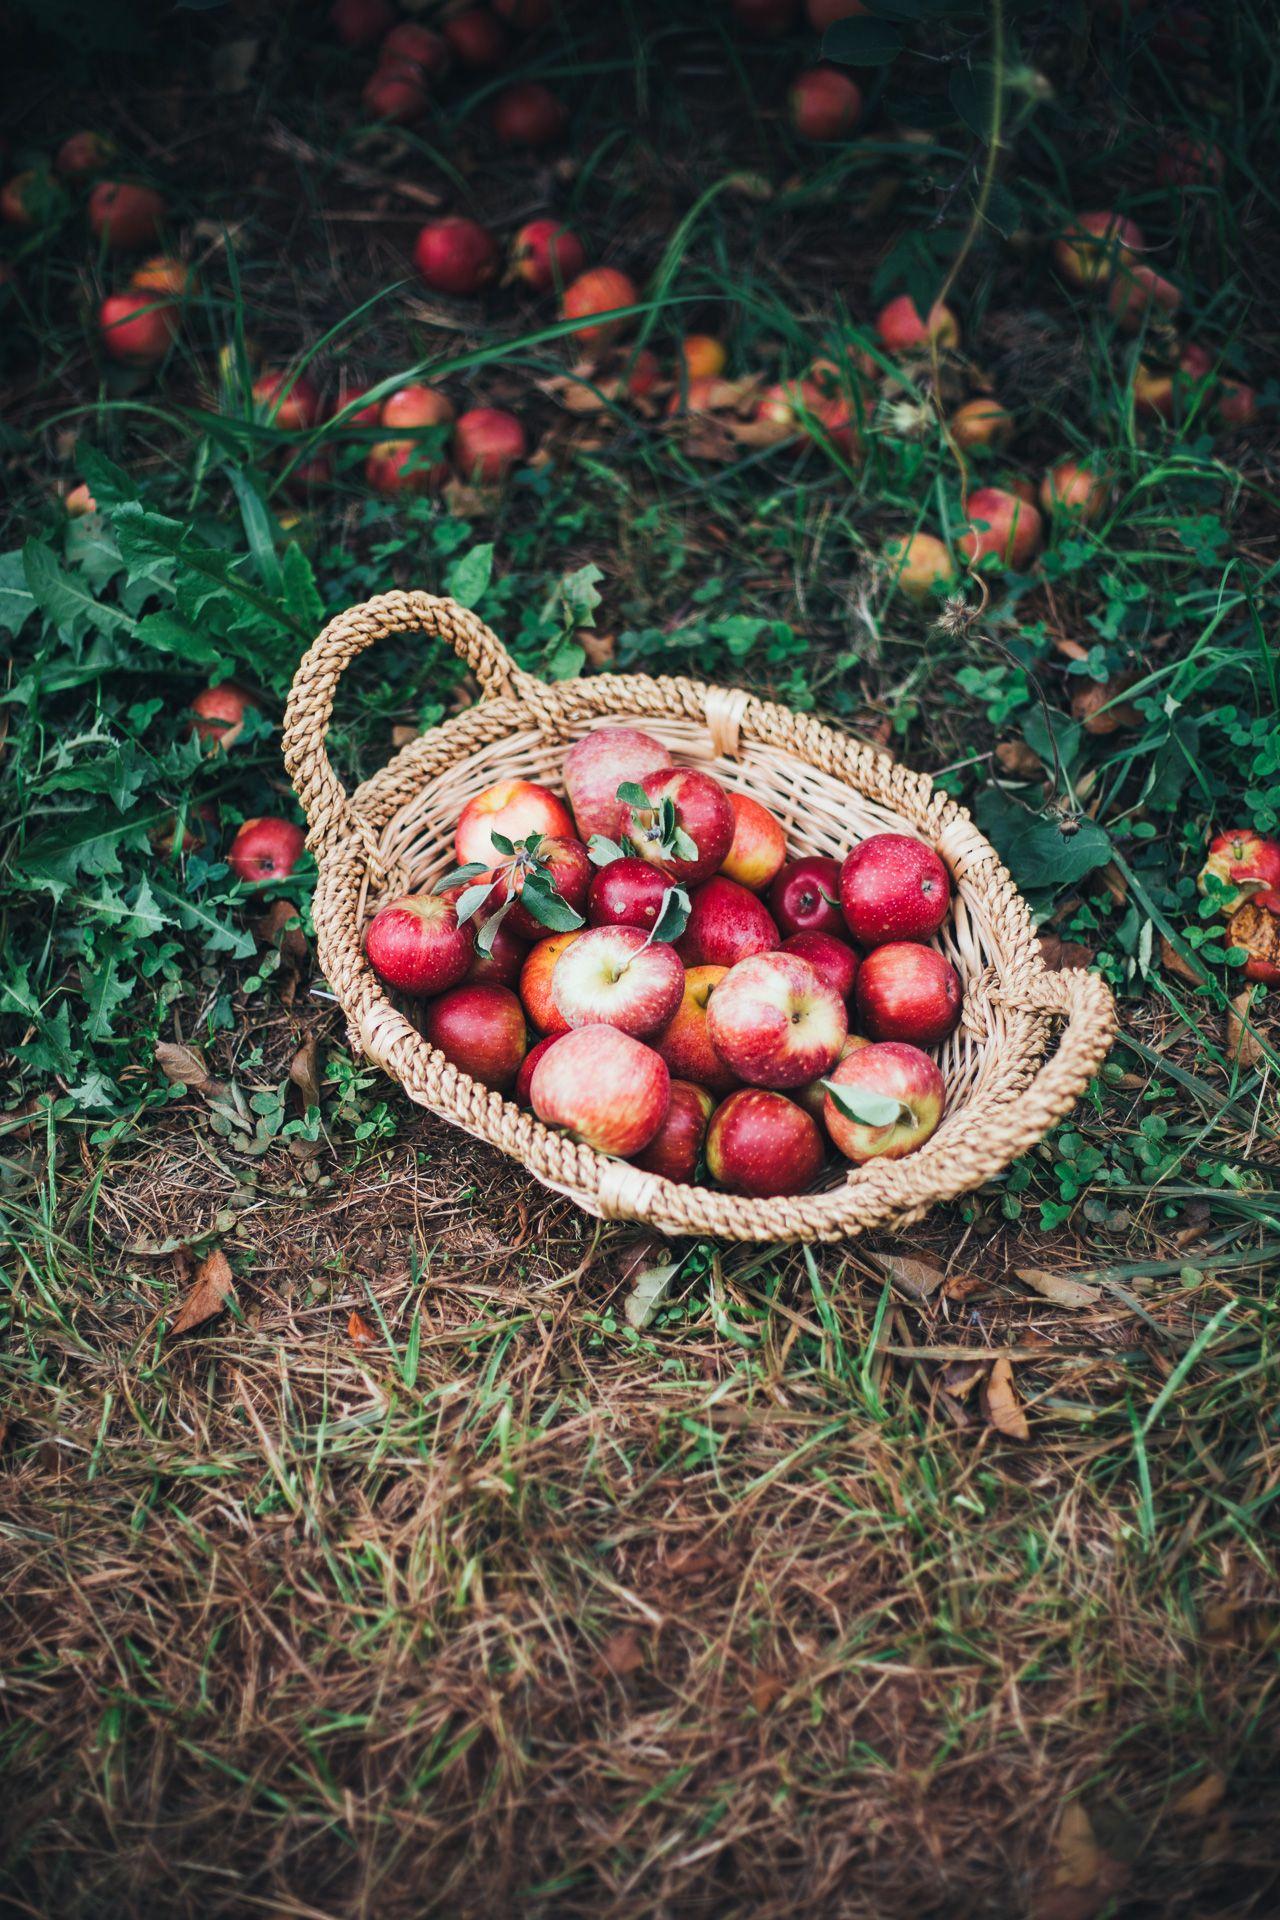 Apple Pie Oatmeal (Vegan, Refined Sugar Free) Recipe